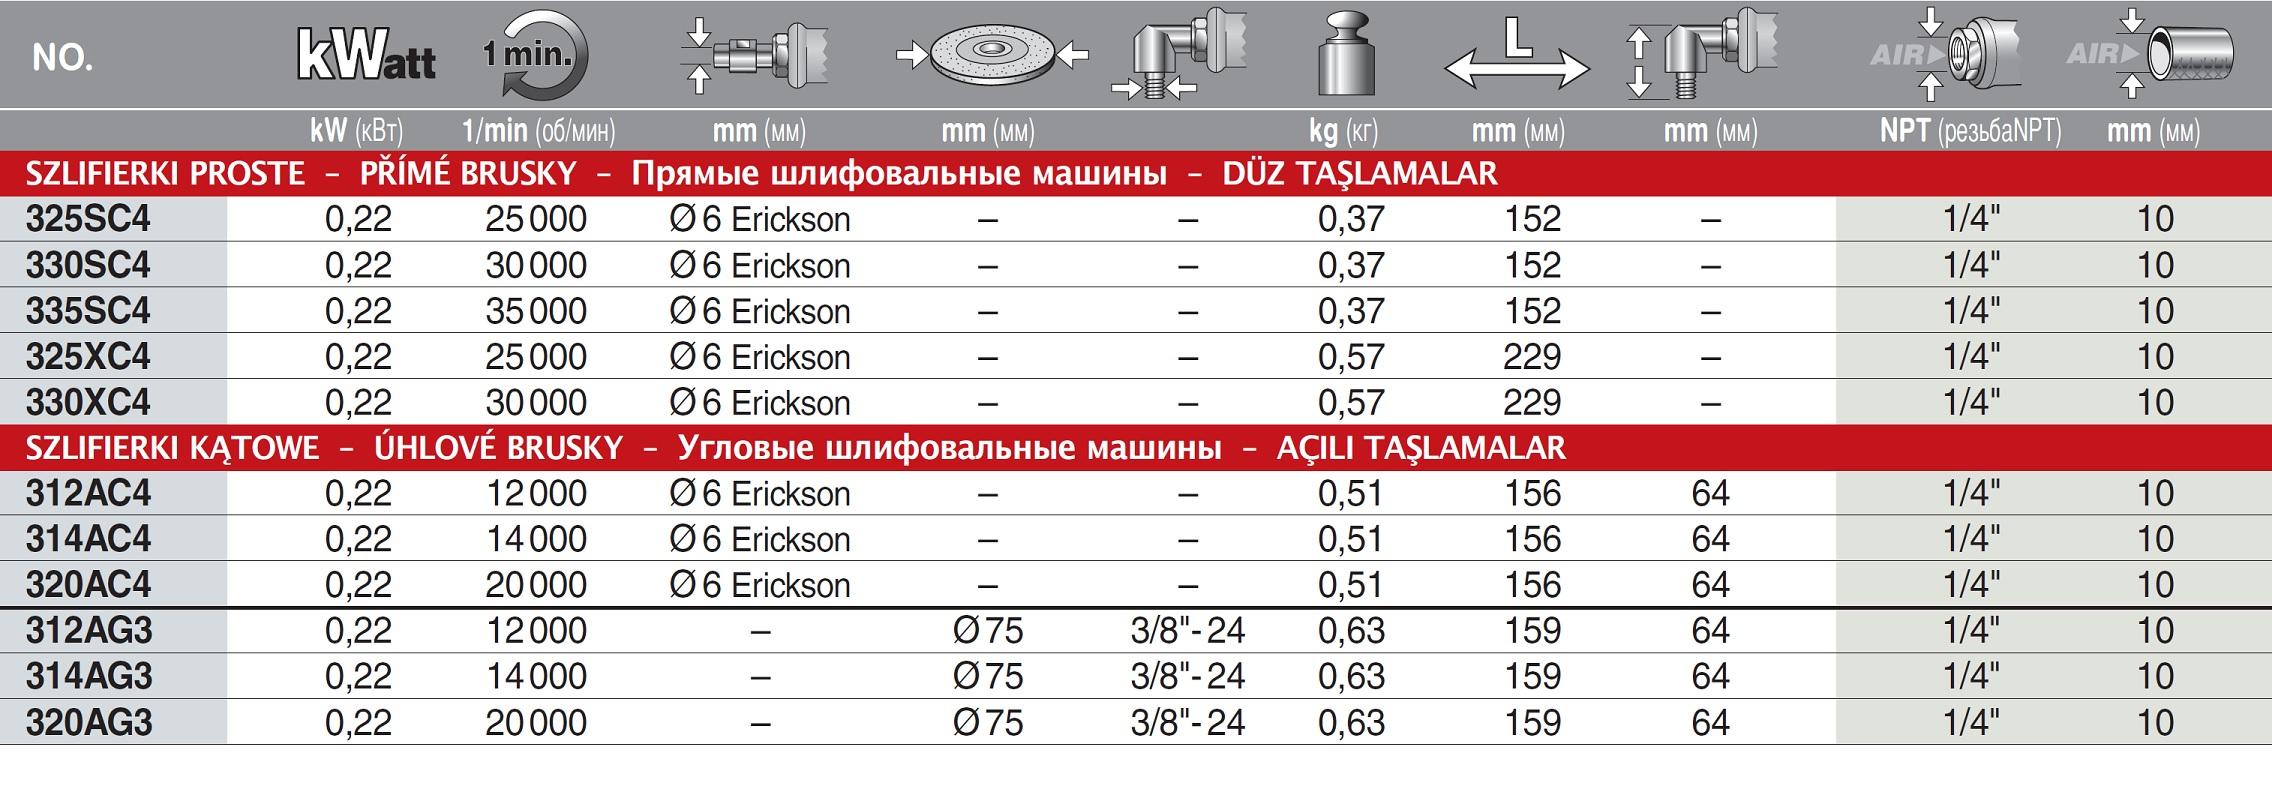 szlifierki pneumtyczne Ingersoll Rand